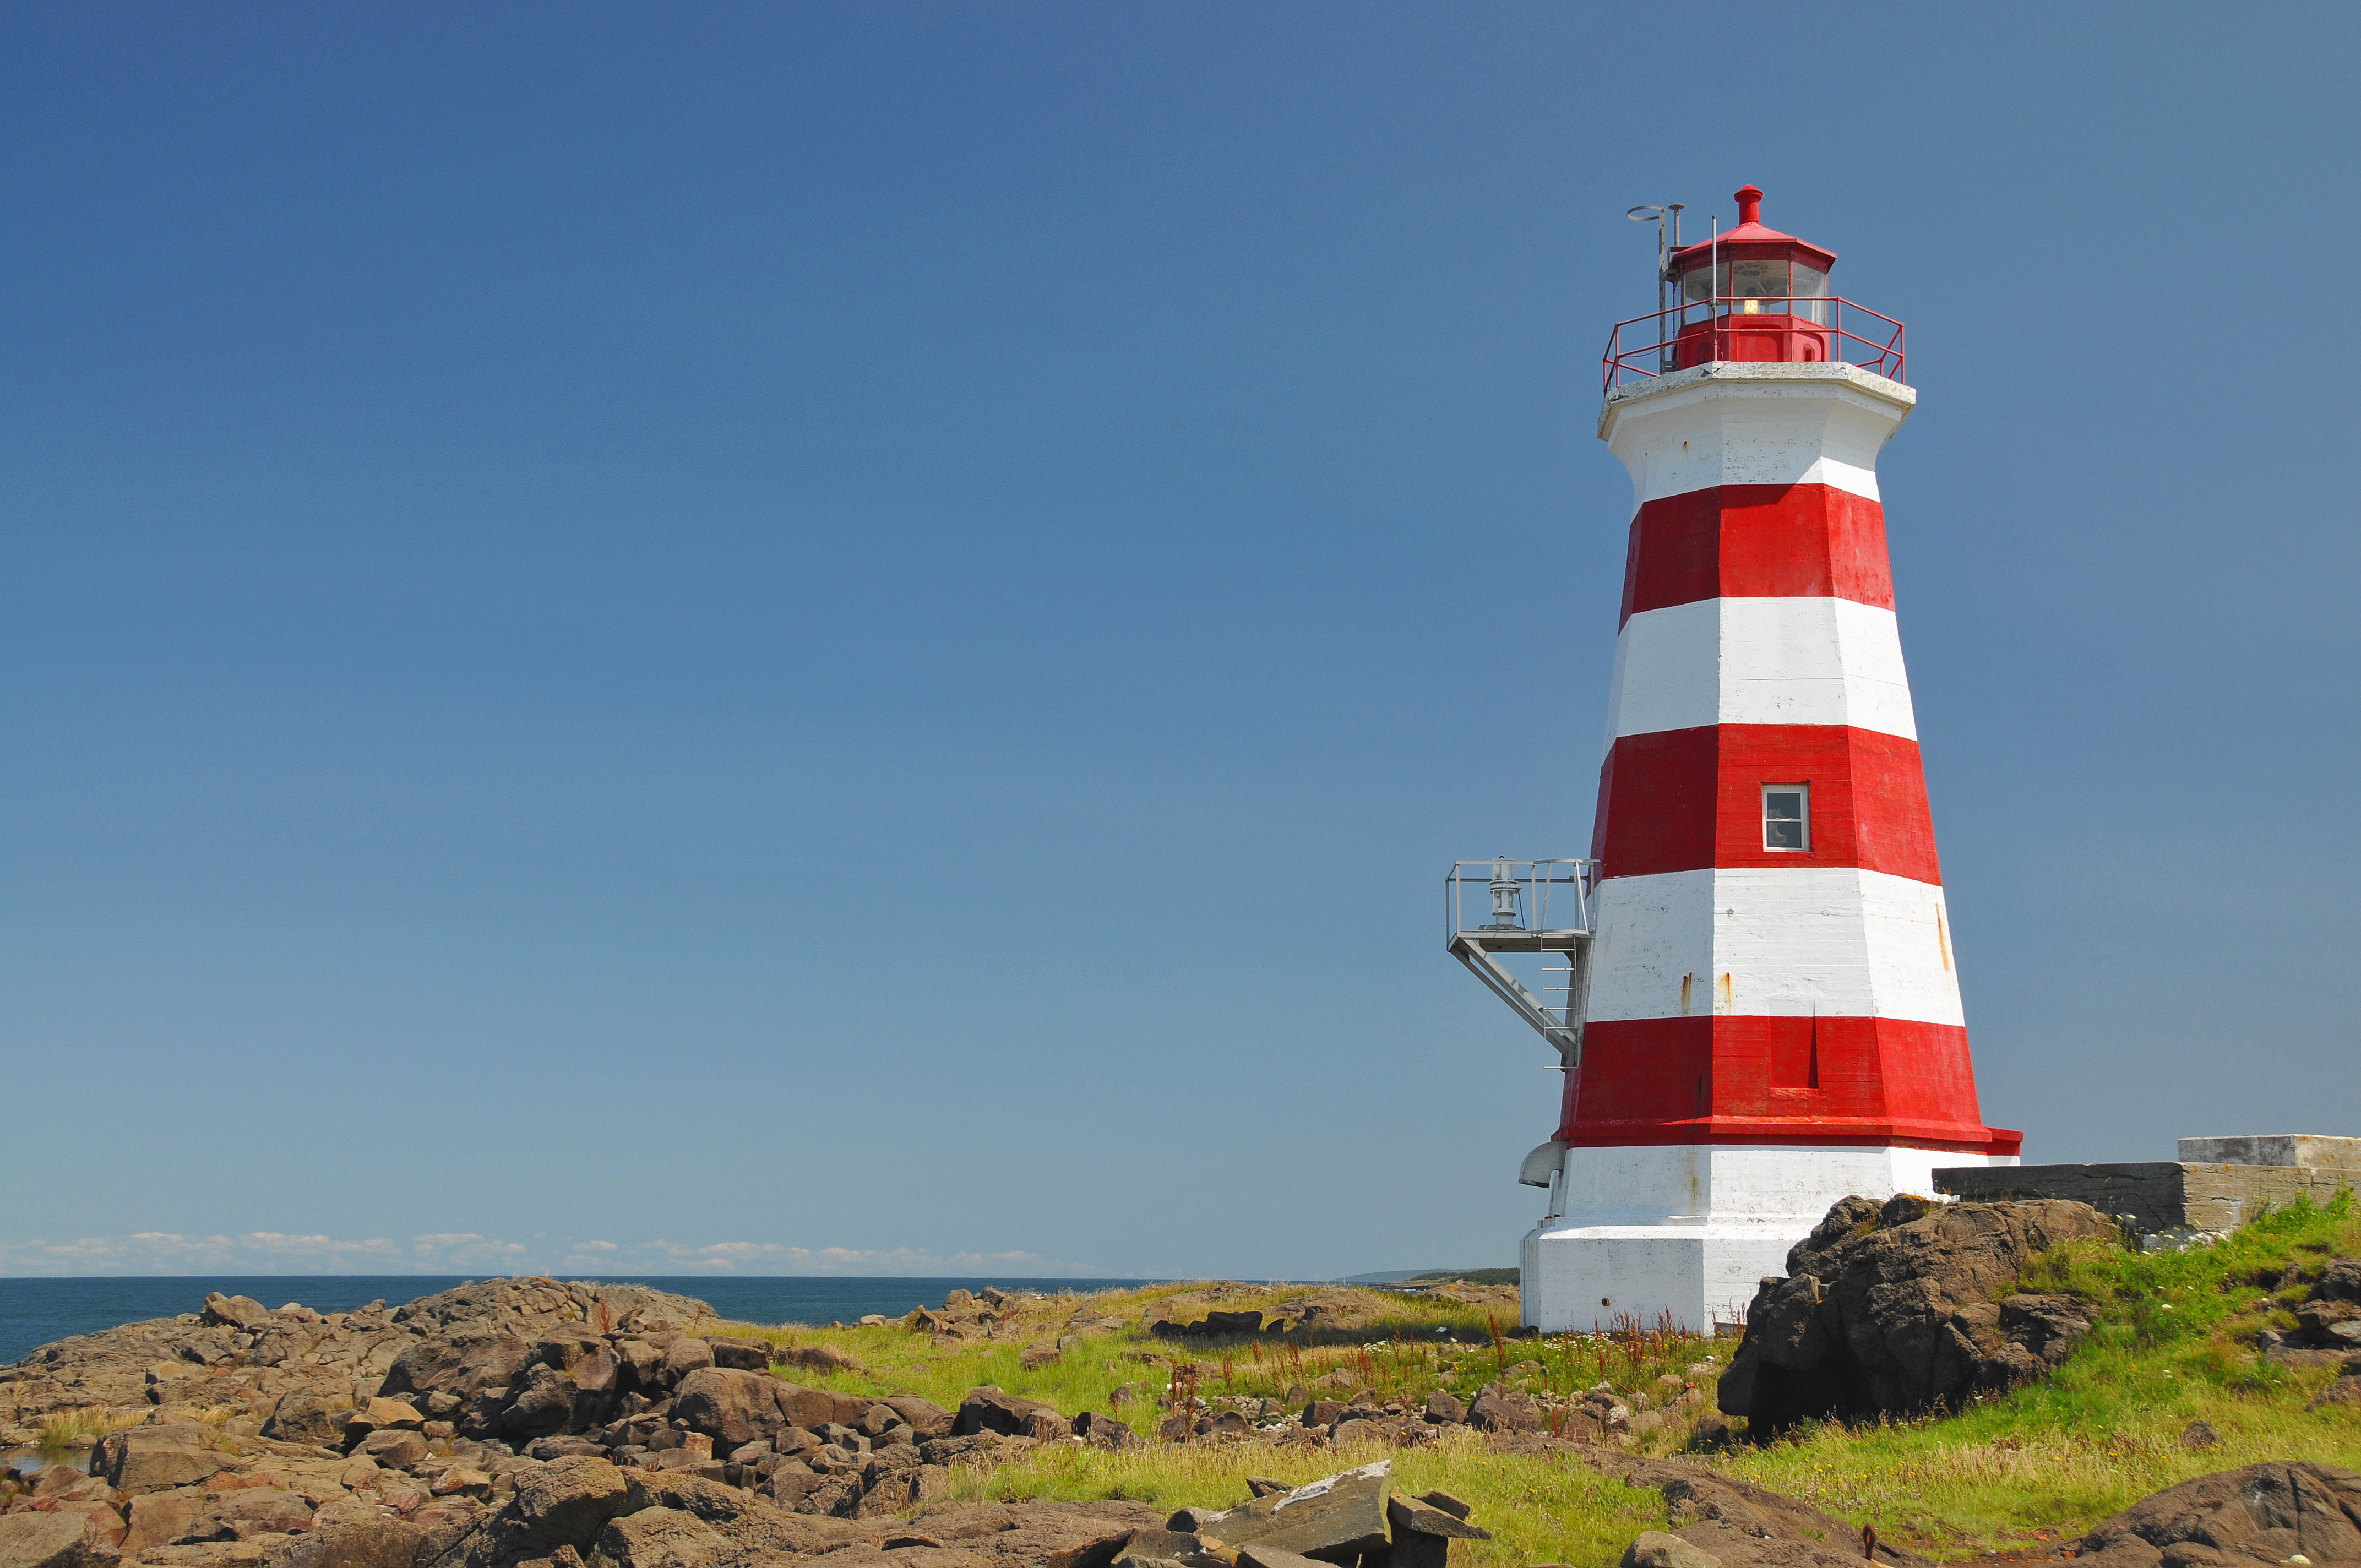 File:Brier Island Lighthouse (1).jpg - Wikimedia Commons